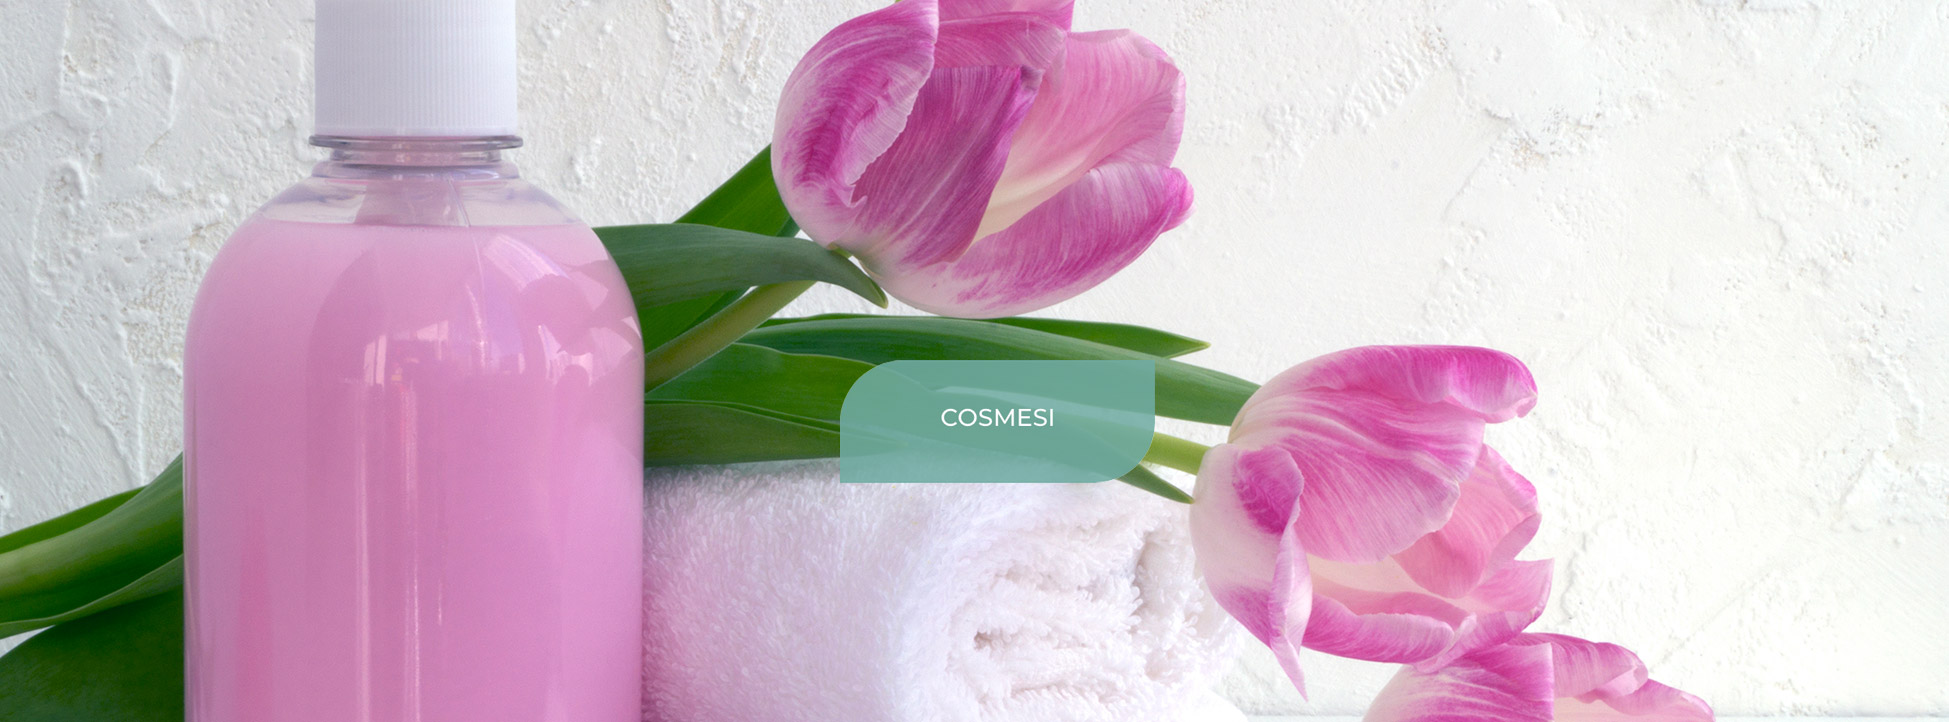 Packaging Imolese cosmesi